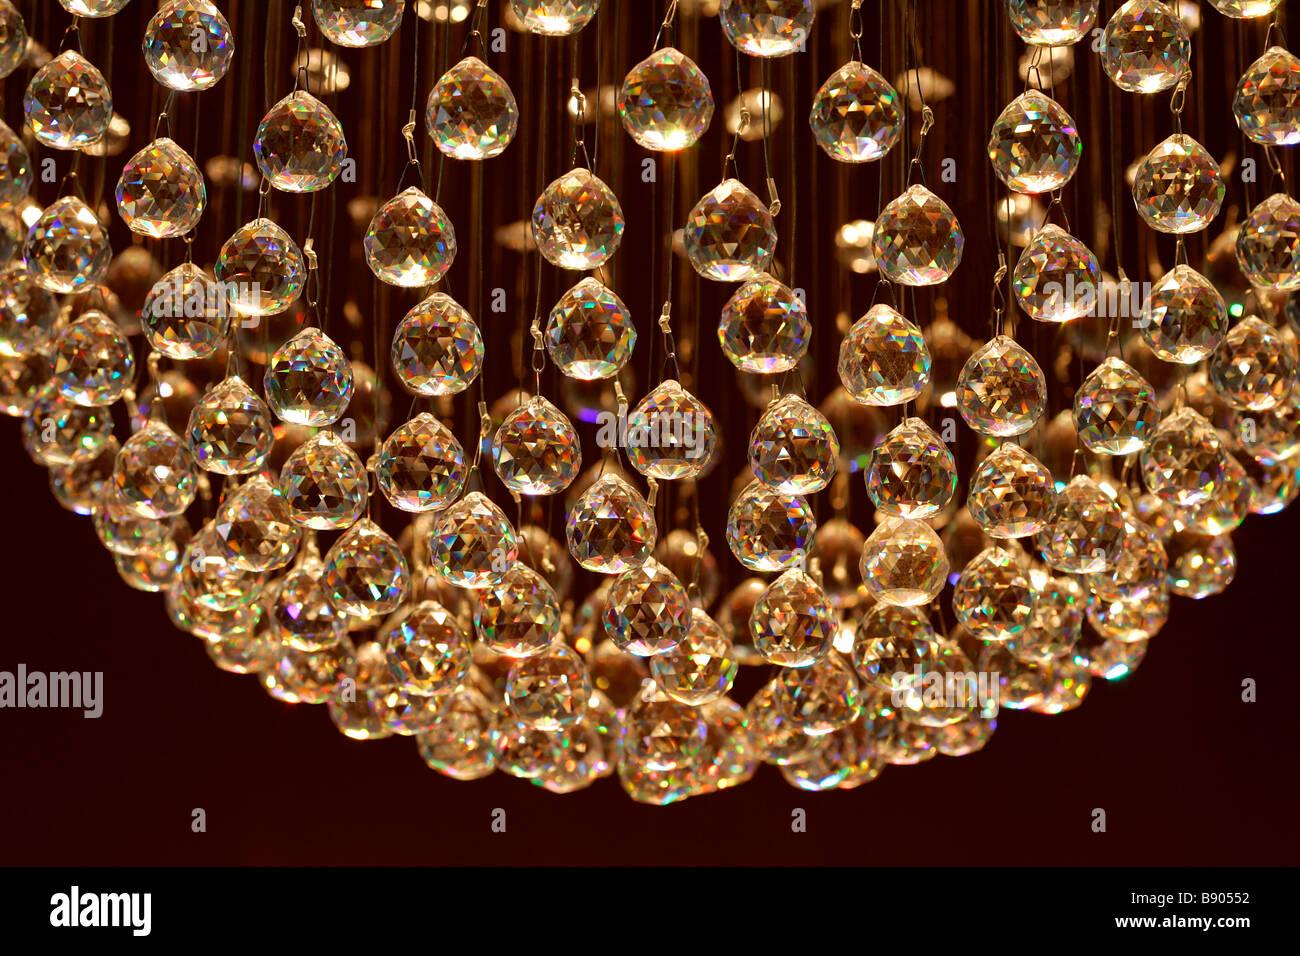 Kronleuchter Echt Kristall ~ Decke kronleuchter kristall glaskugeln licht leuchten beleuchtung